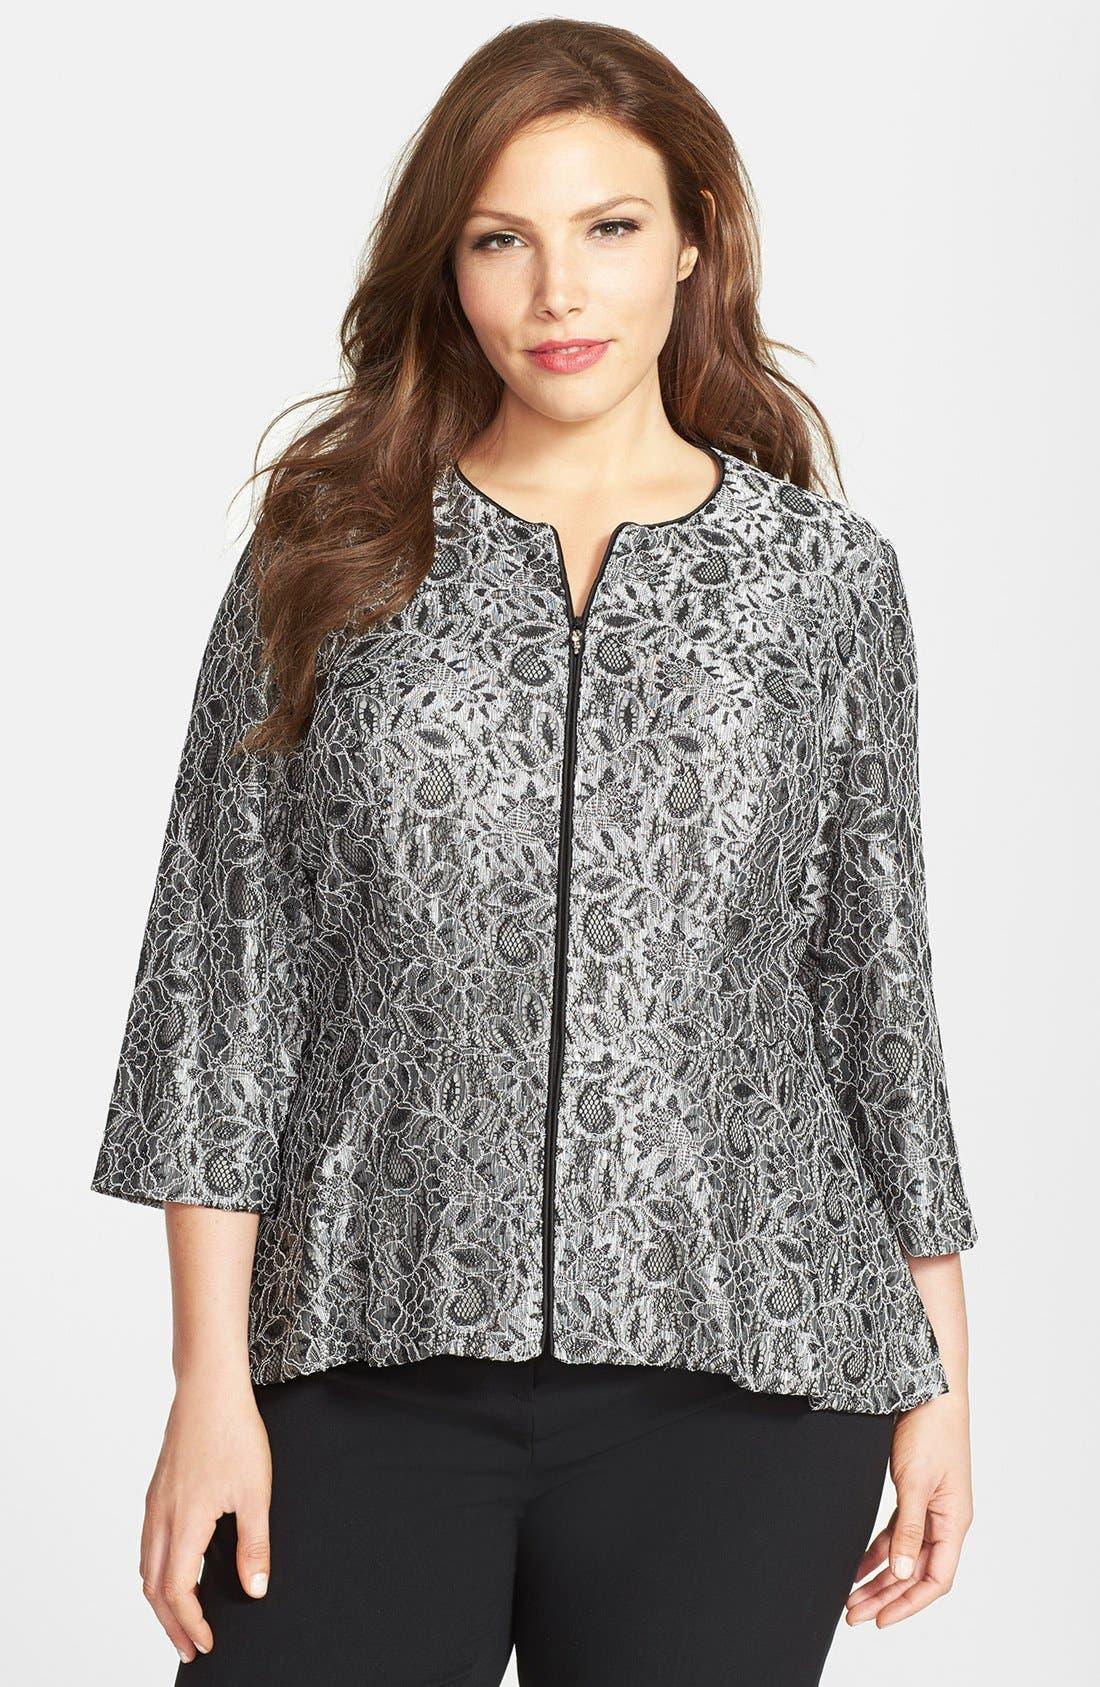 Alternate Image 1 Selected - Alex Evenings Collarless Metallic Lace Jacket (Plus Size)